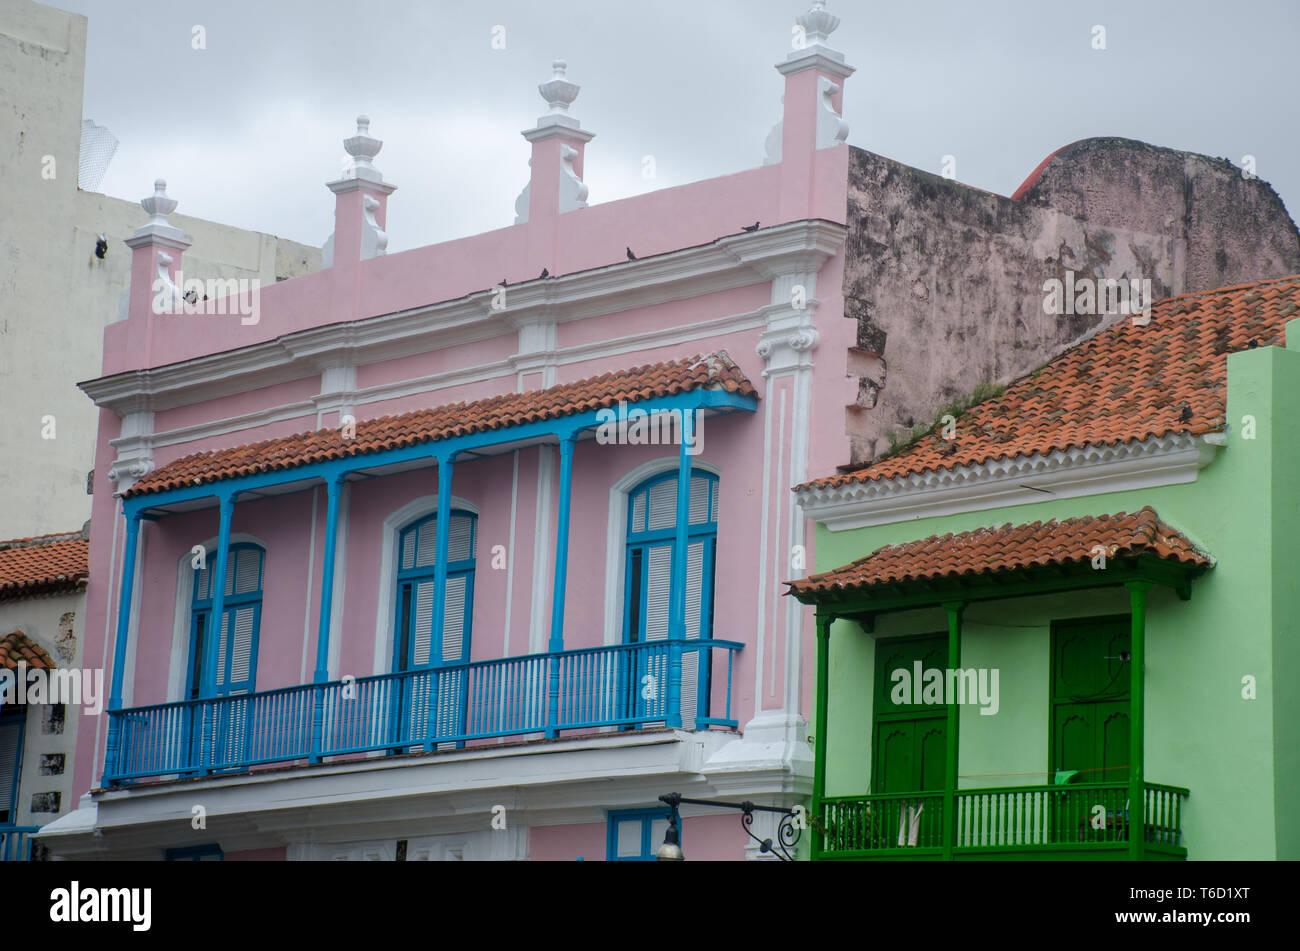 Old Havana Colonial Centre Stock Photos & Old Havana